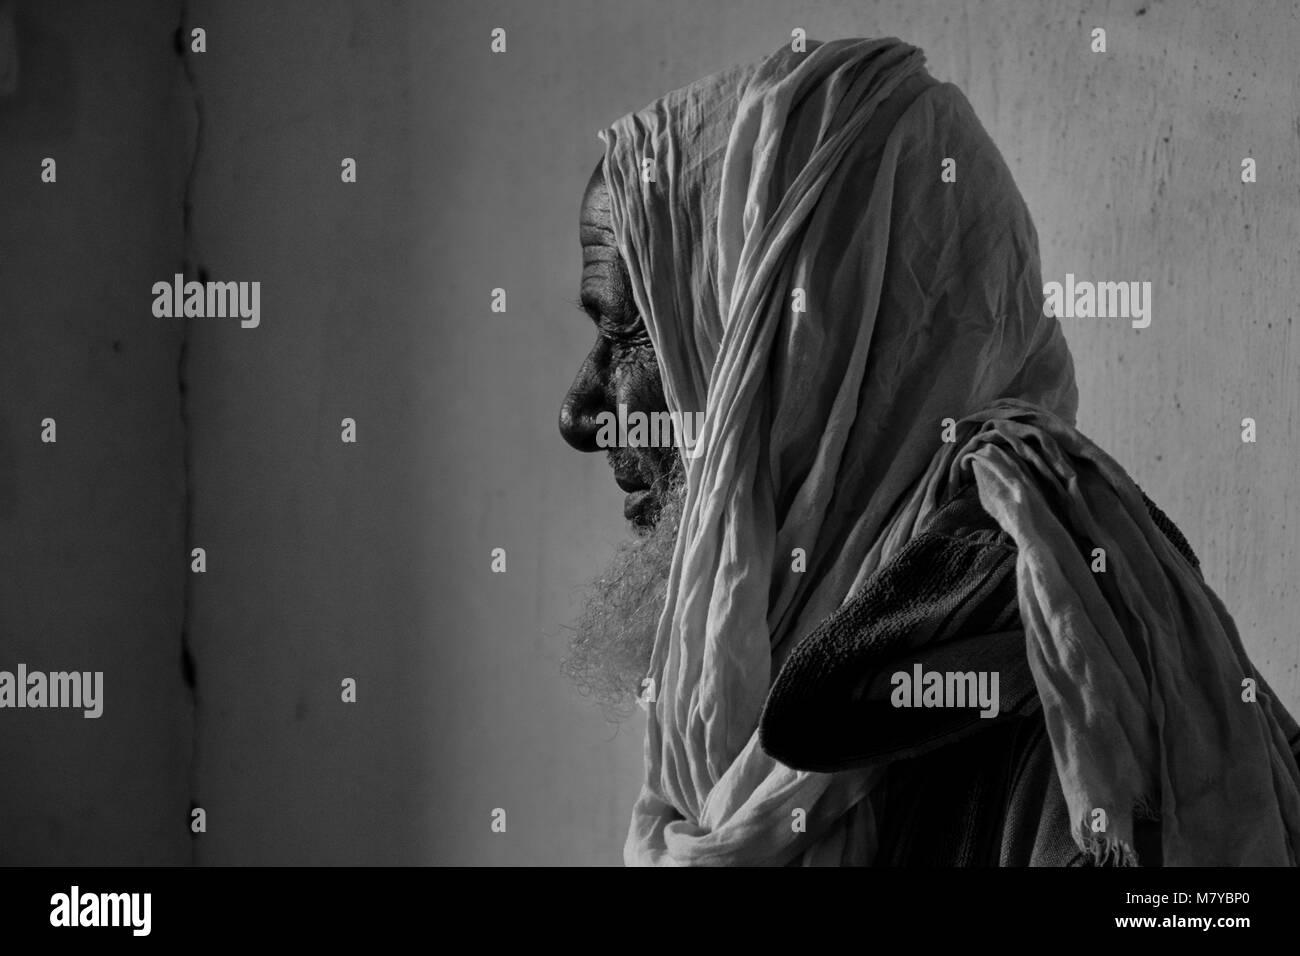 Old man in Smara, Saharawi refugees camp. - Stock Image